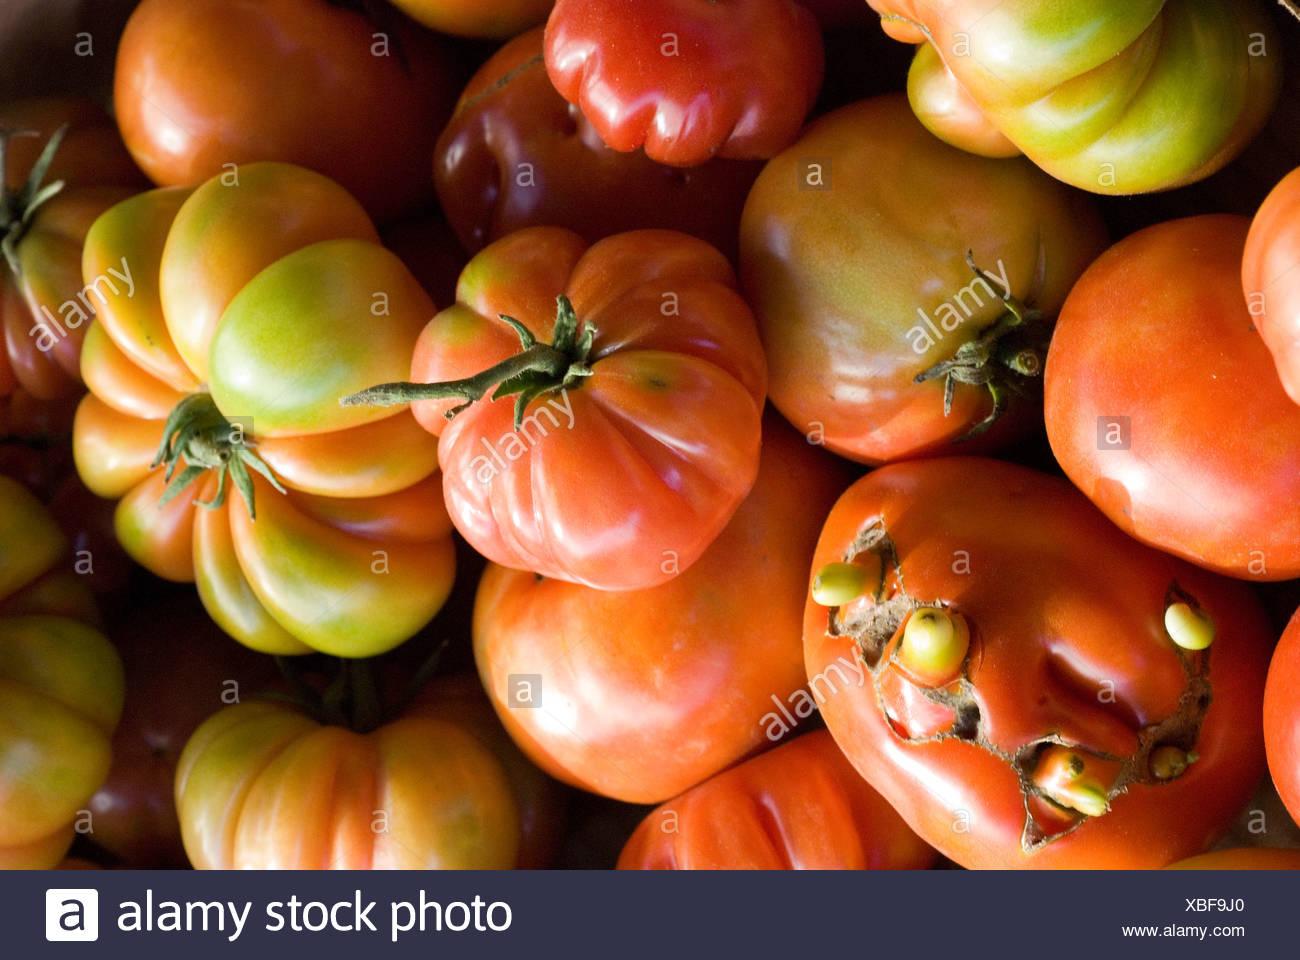 Coeur de boeuf tomatoes - Stock Image